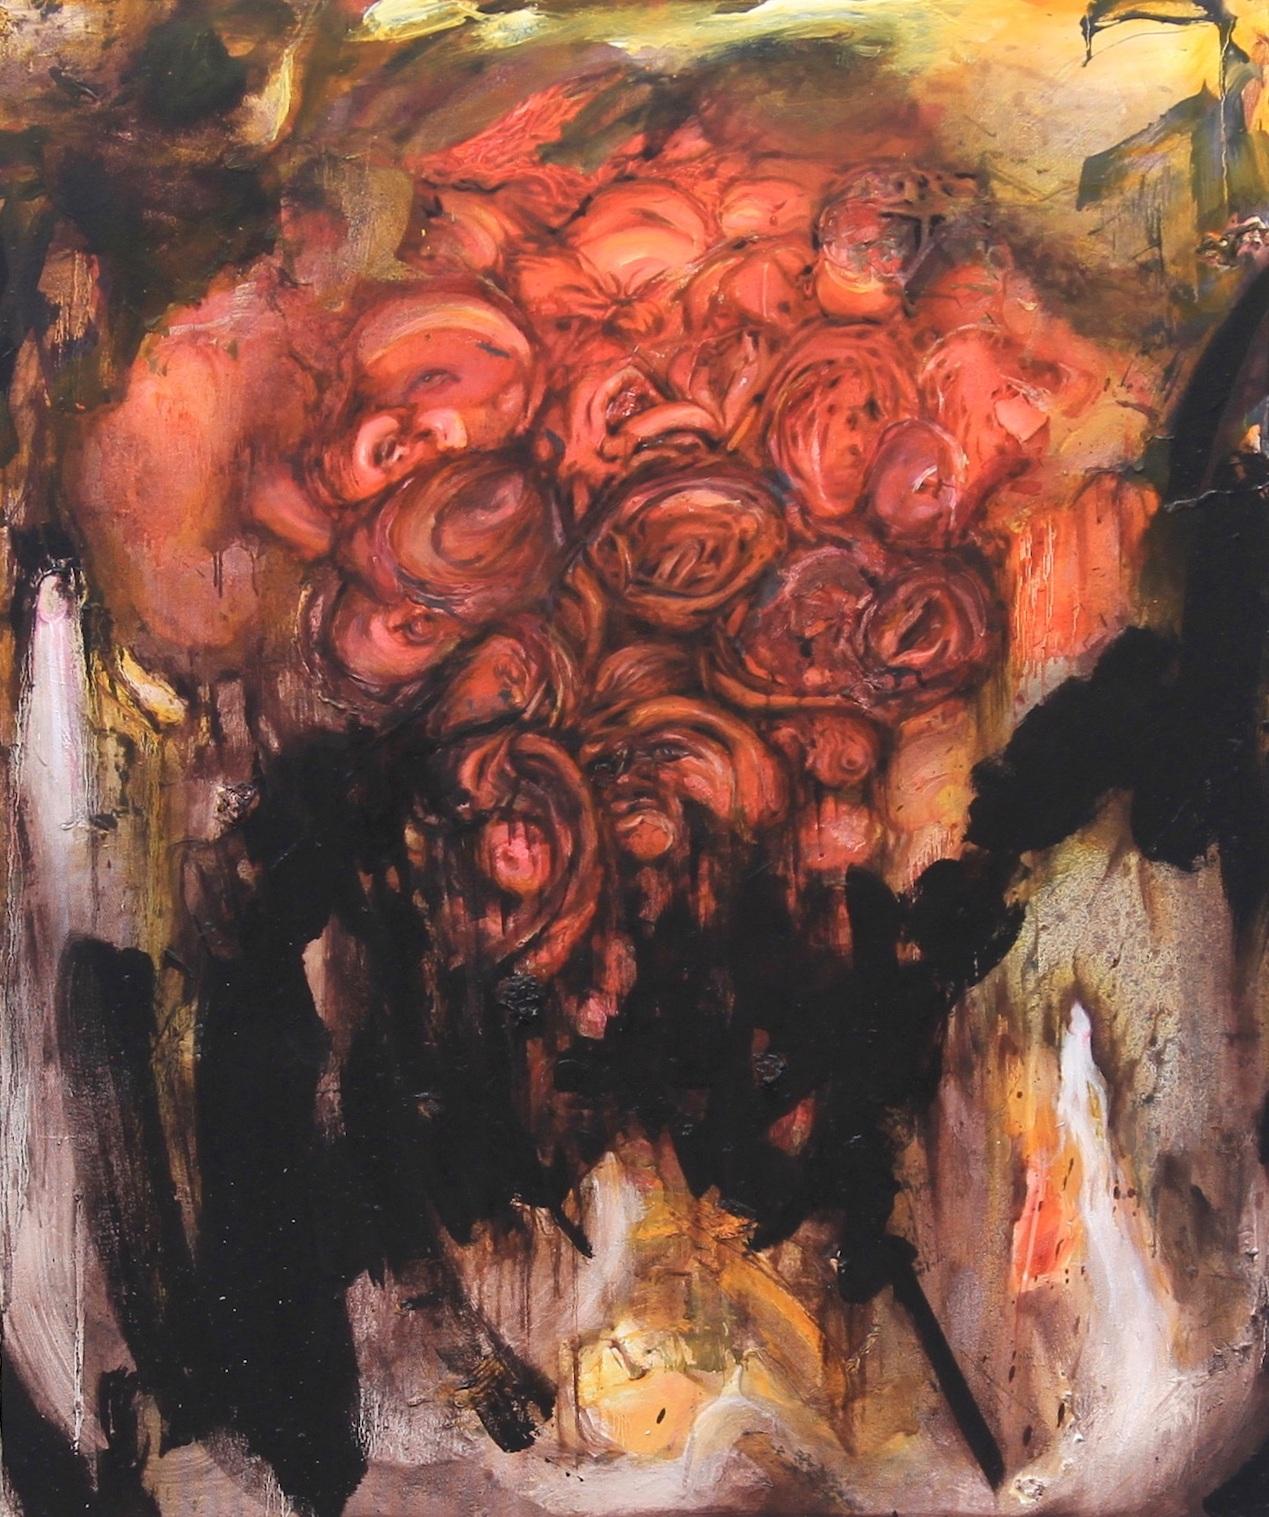 Saturday Night Feast / 2012 / Oil on canvas